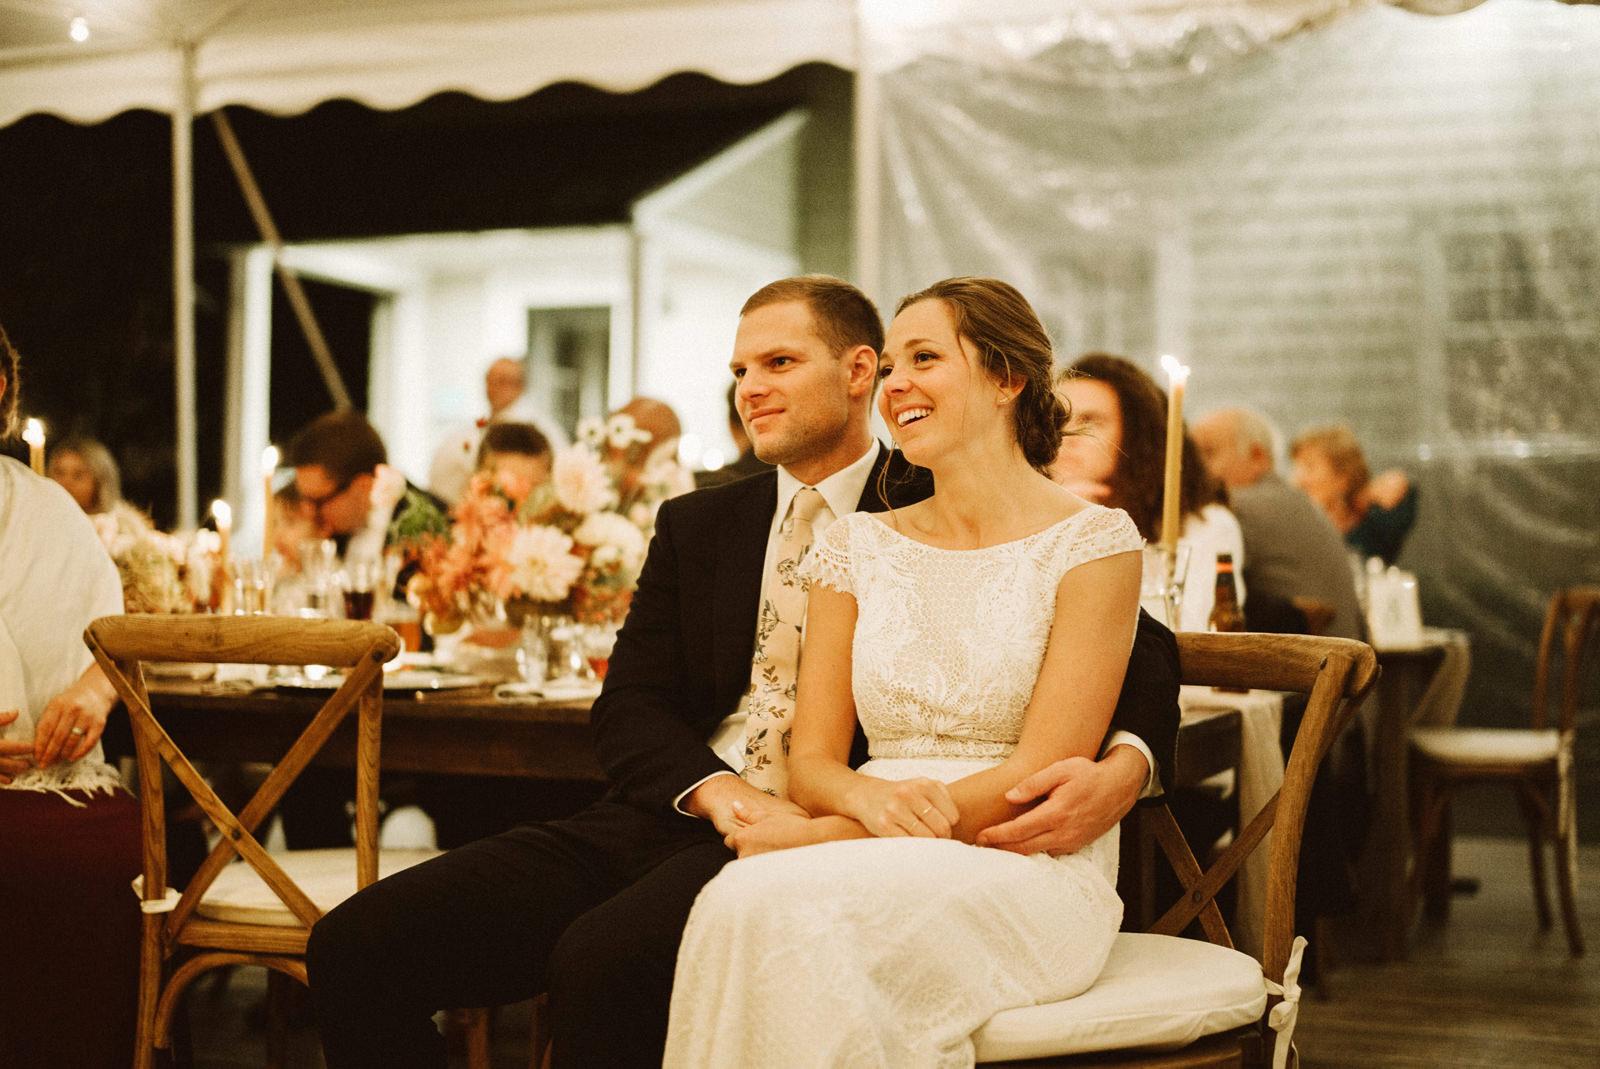 bridgeport-wedding-153 BRIDGEPORT, CONNECTICUT BACKYARD WEDDING